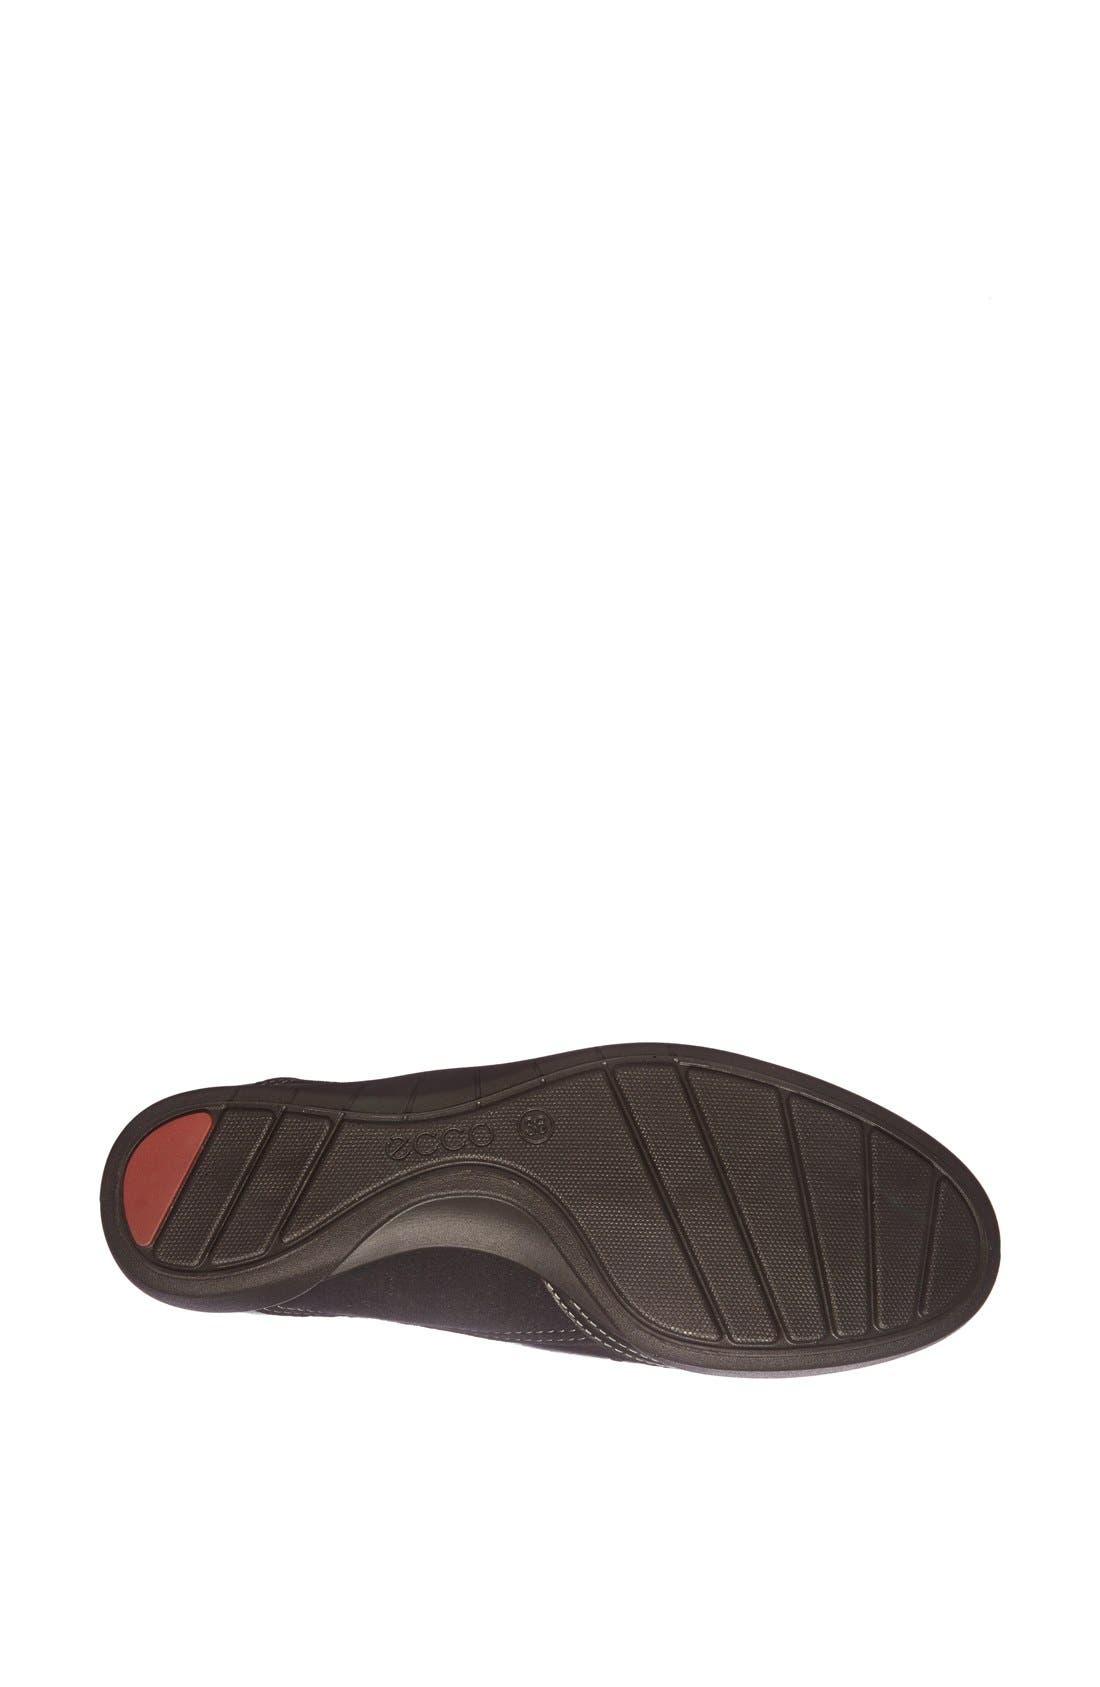 'Bluma' Sneaker,                             Alternate thumbnail 8, color,